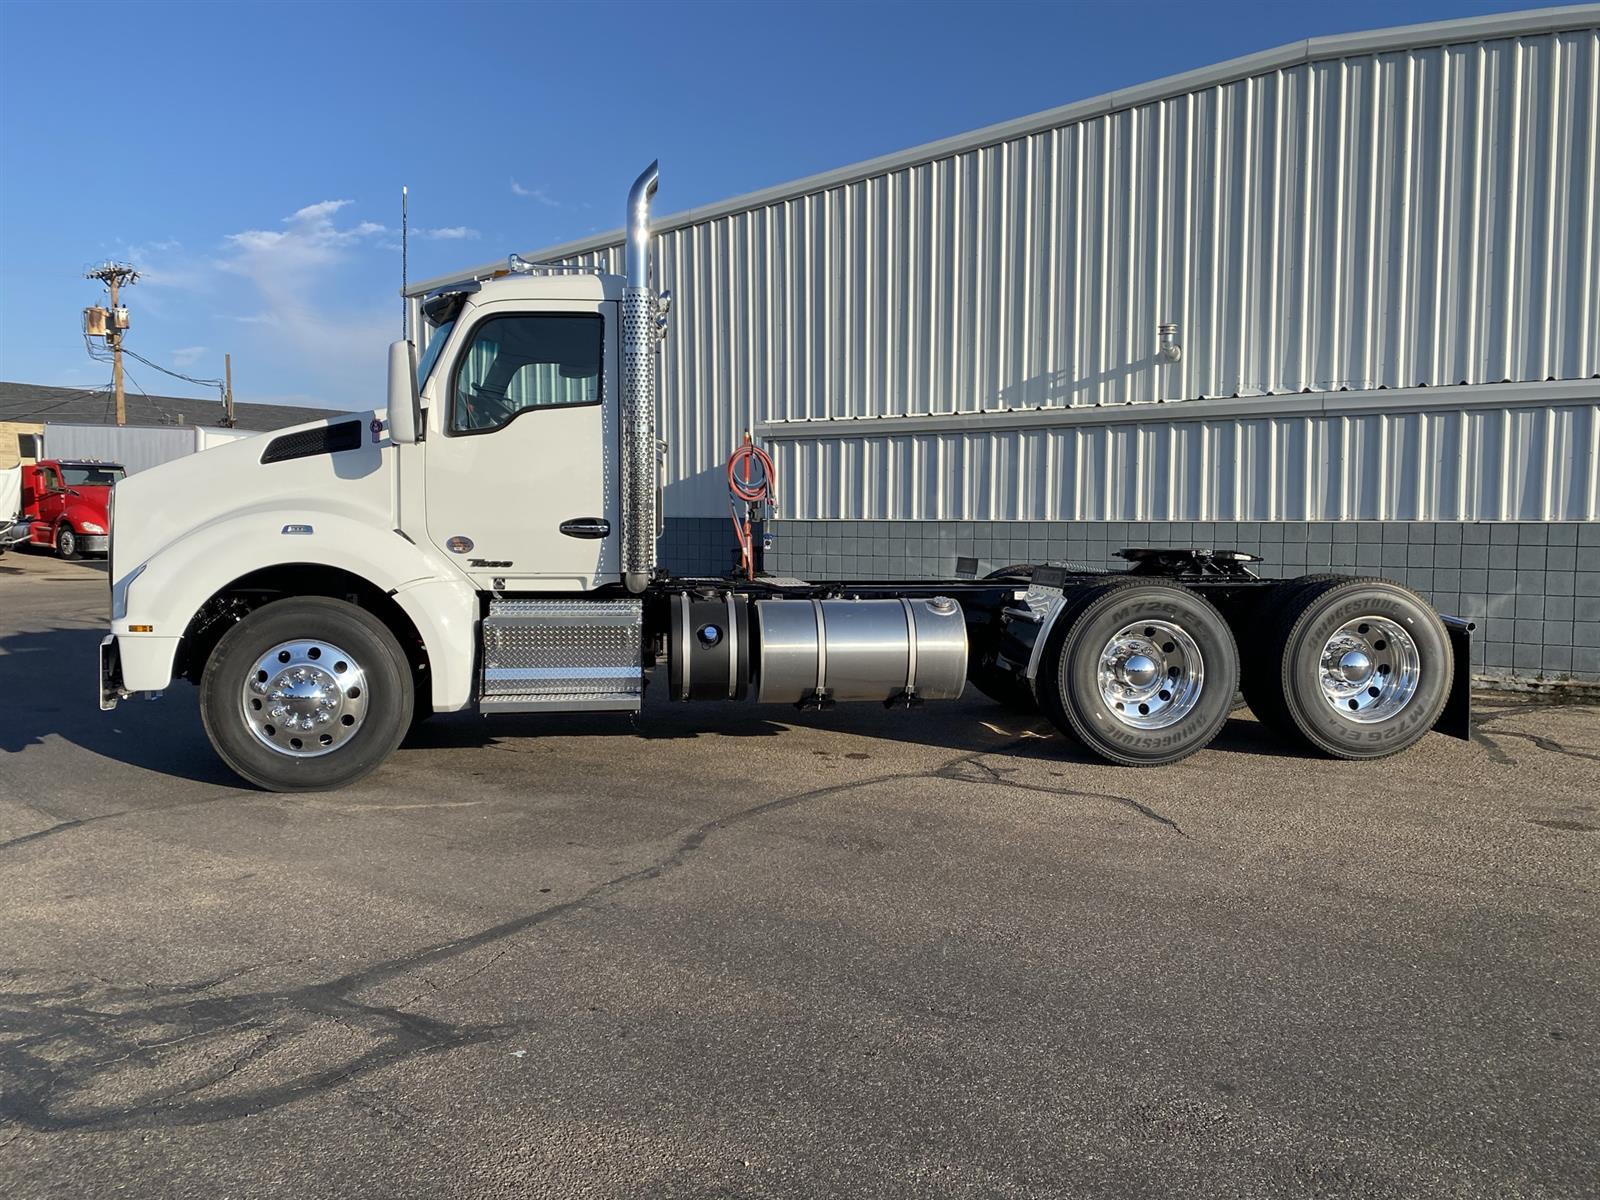 2021 Kenworth T880 6x4, Tractor #MJ464188 - photo 1